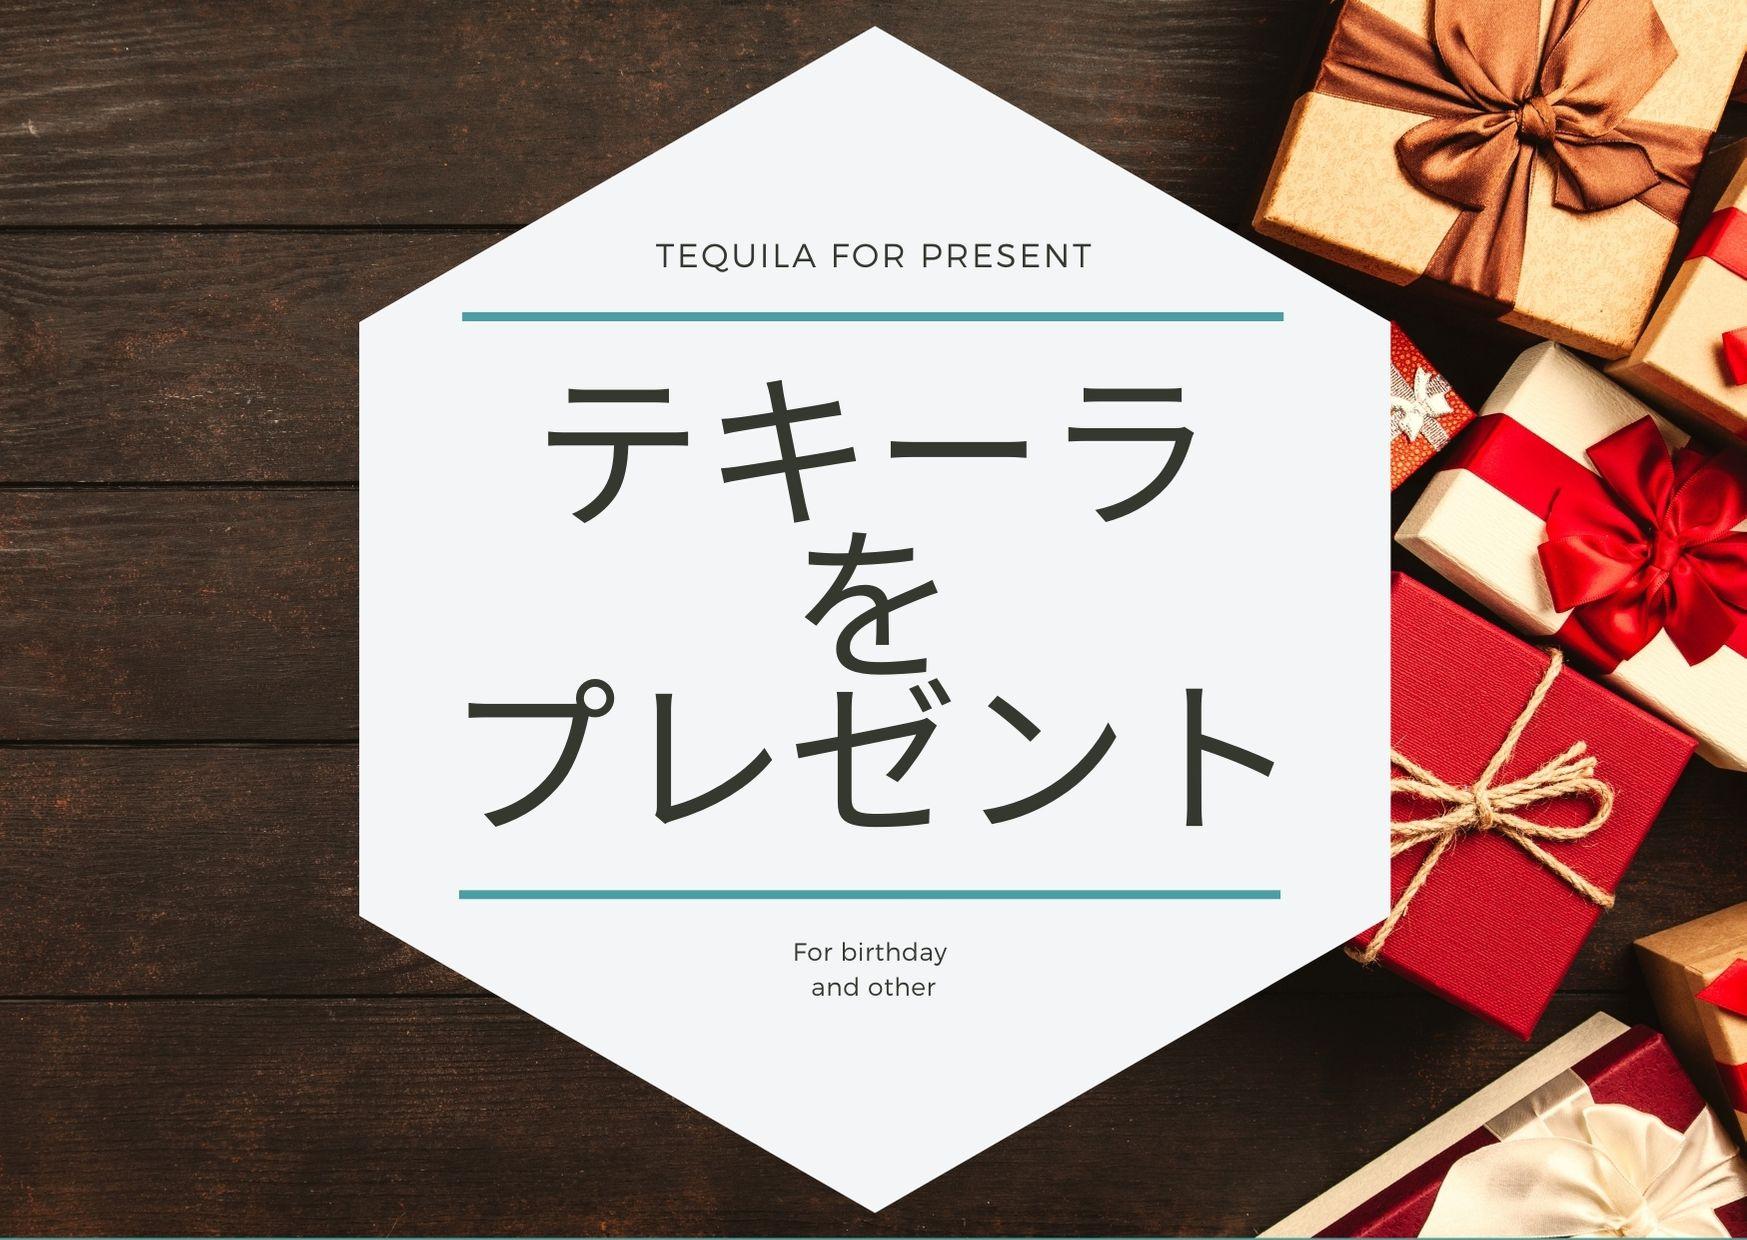 tequila_present